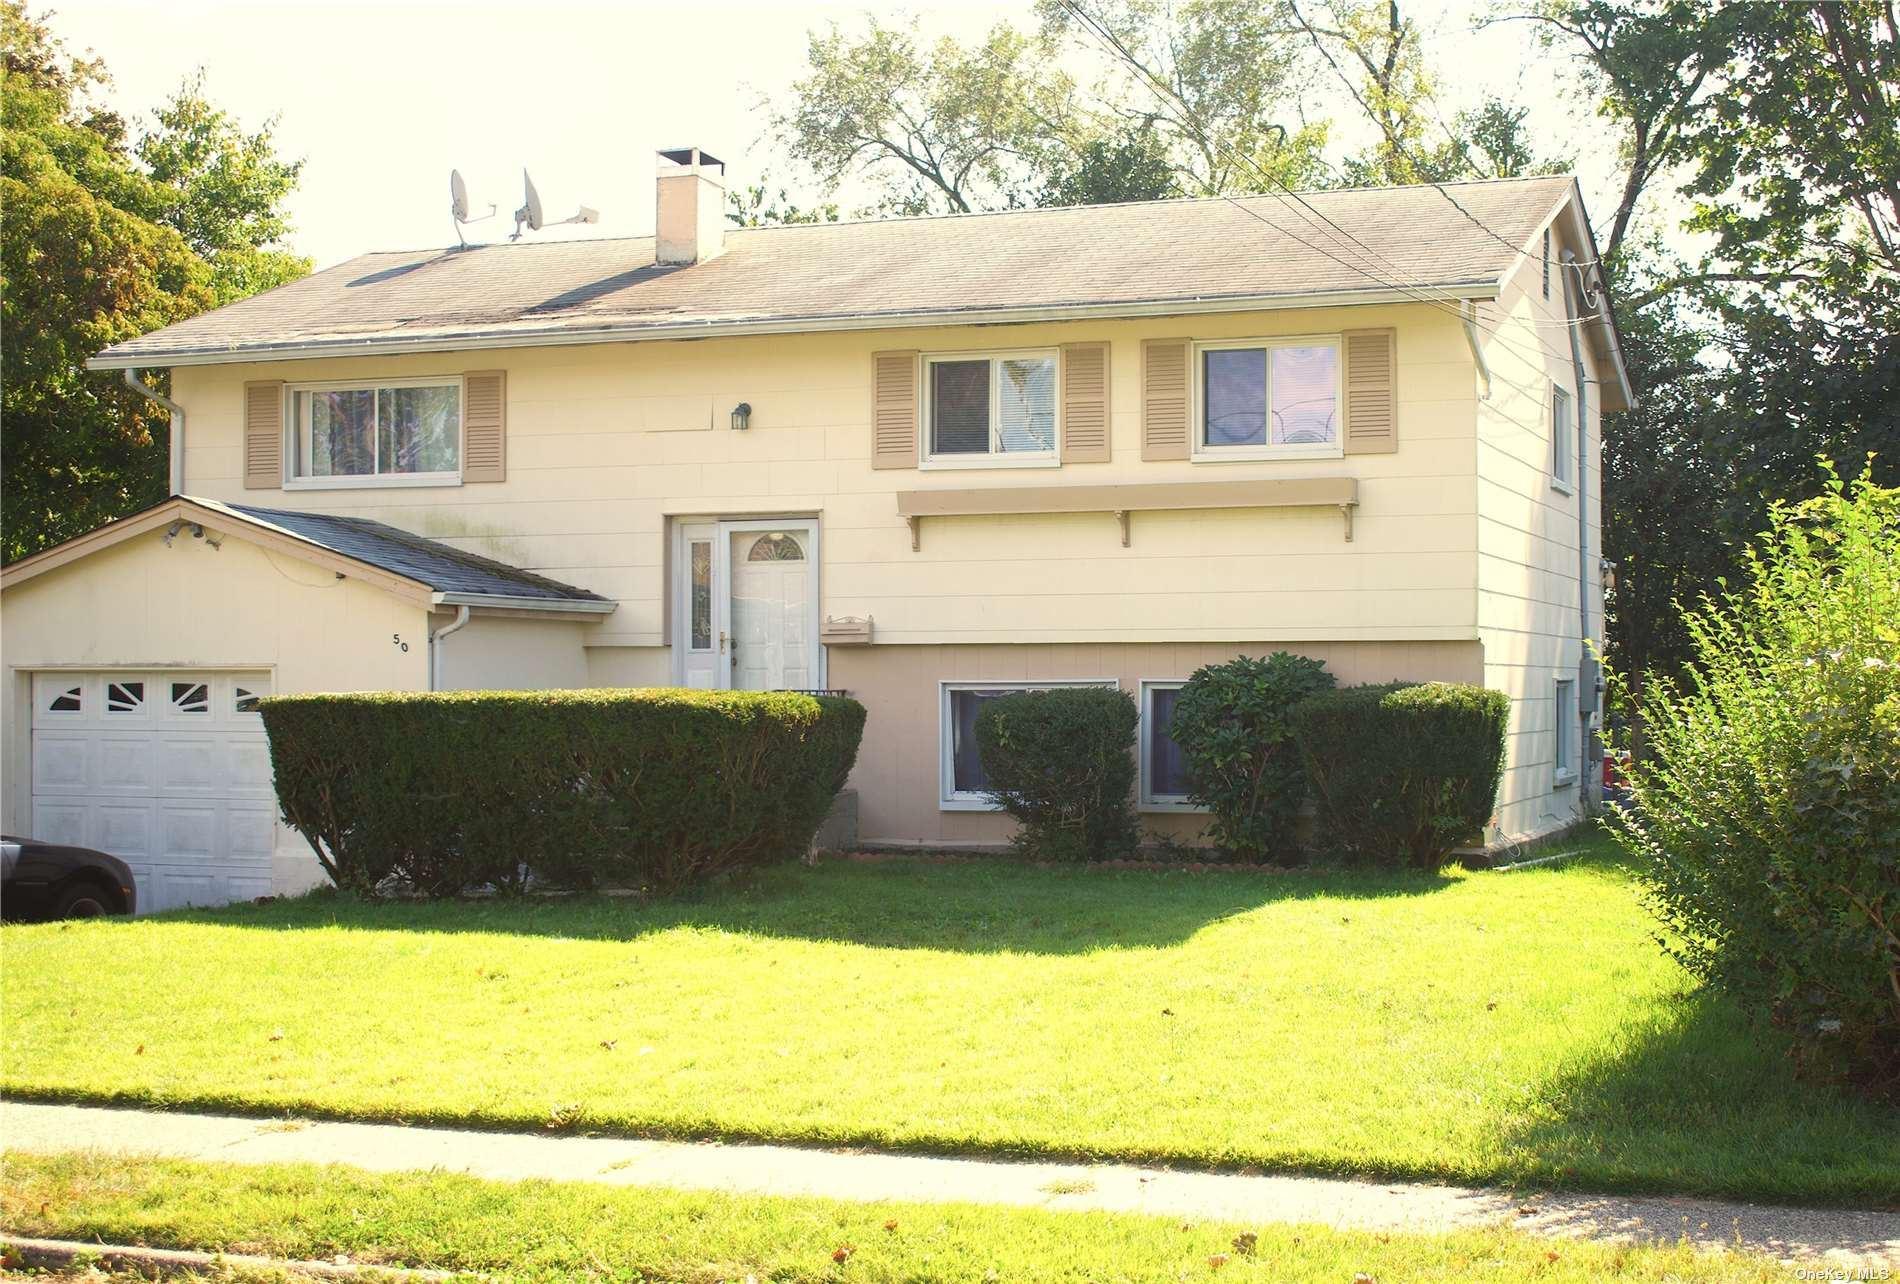 50 Clarke Street, Brentwood, NY 11717 - MLS#: 3353412